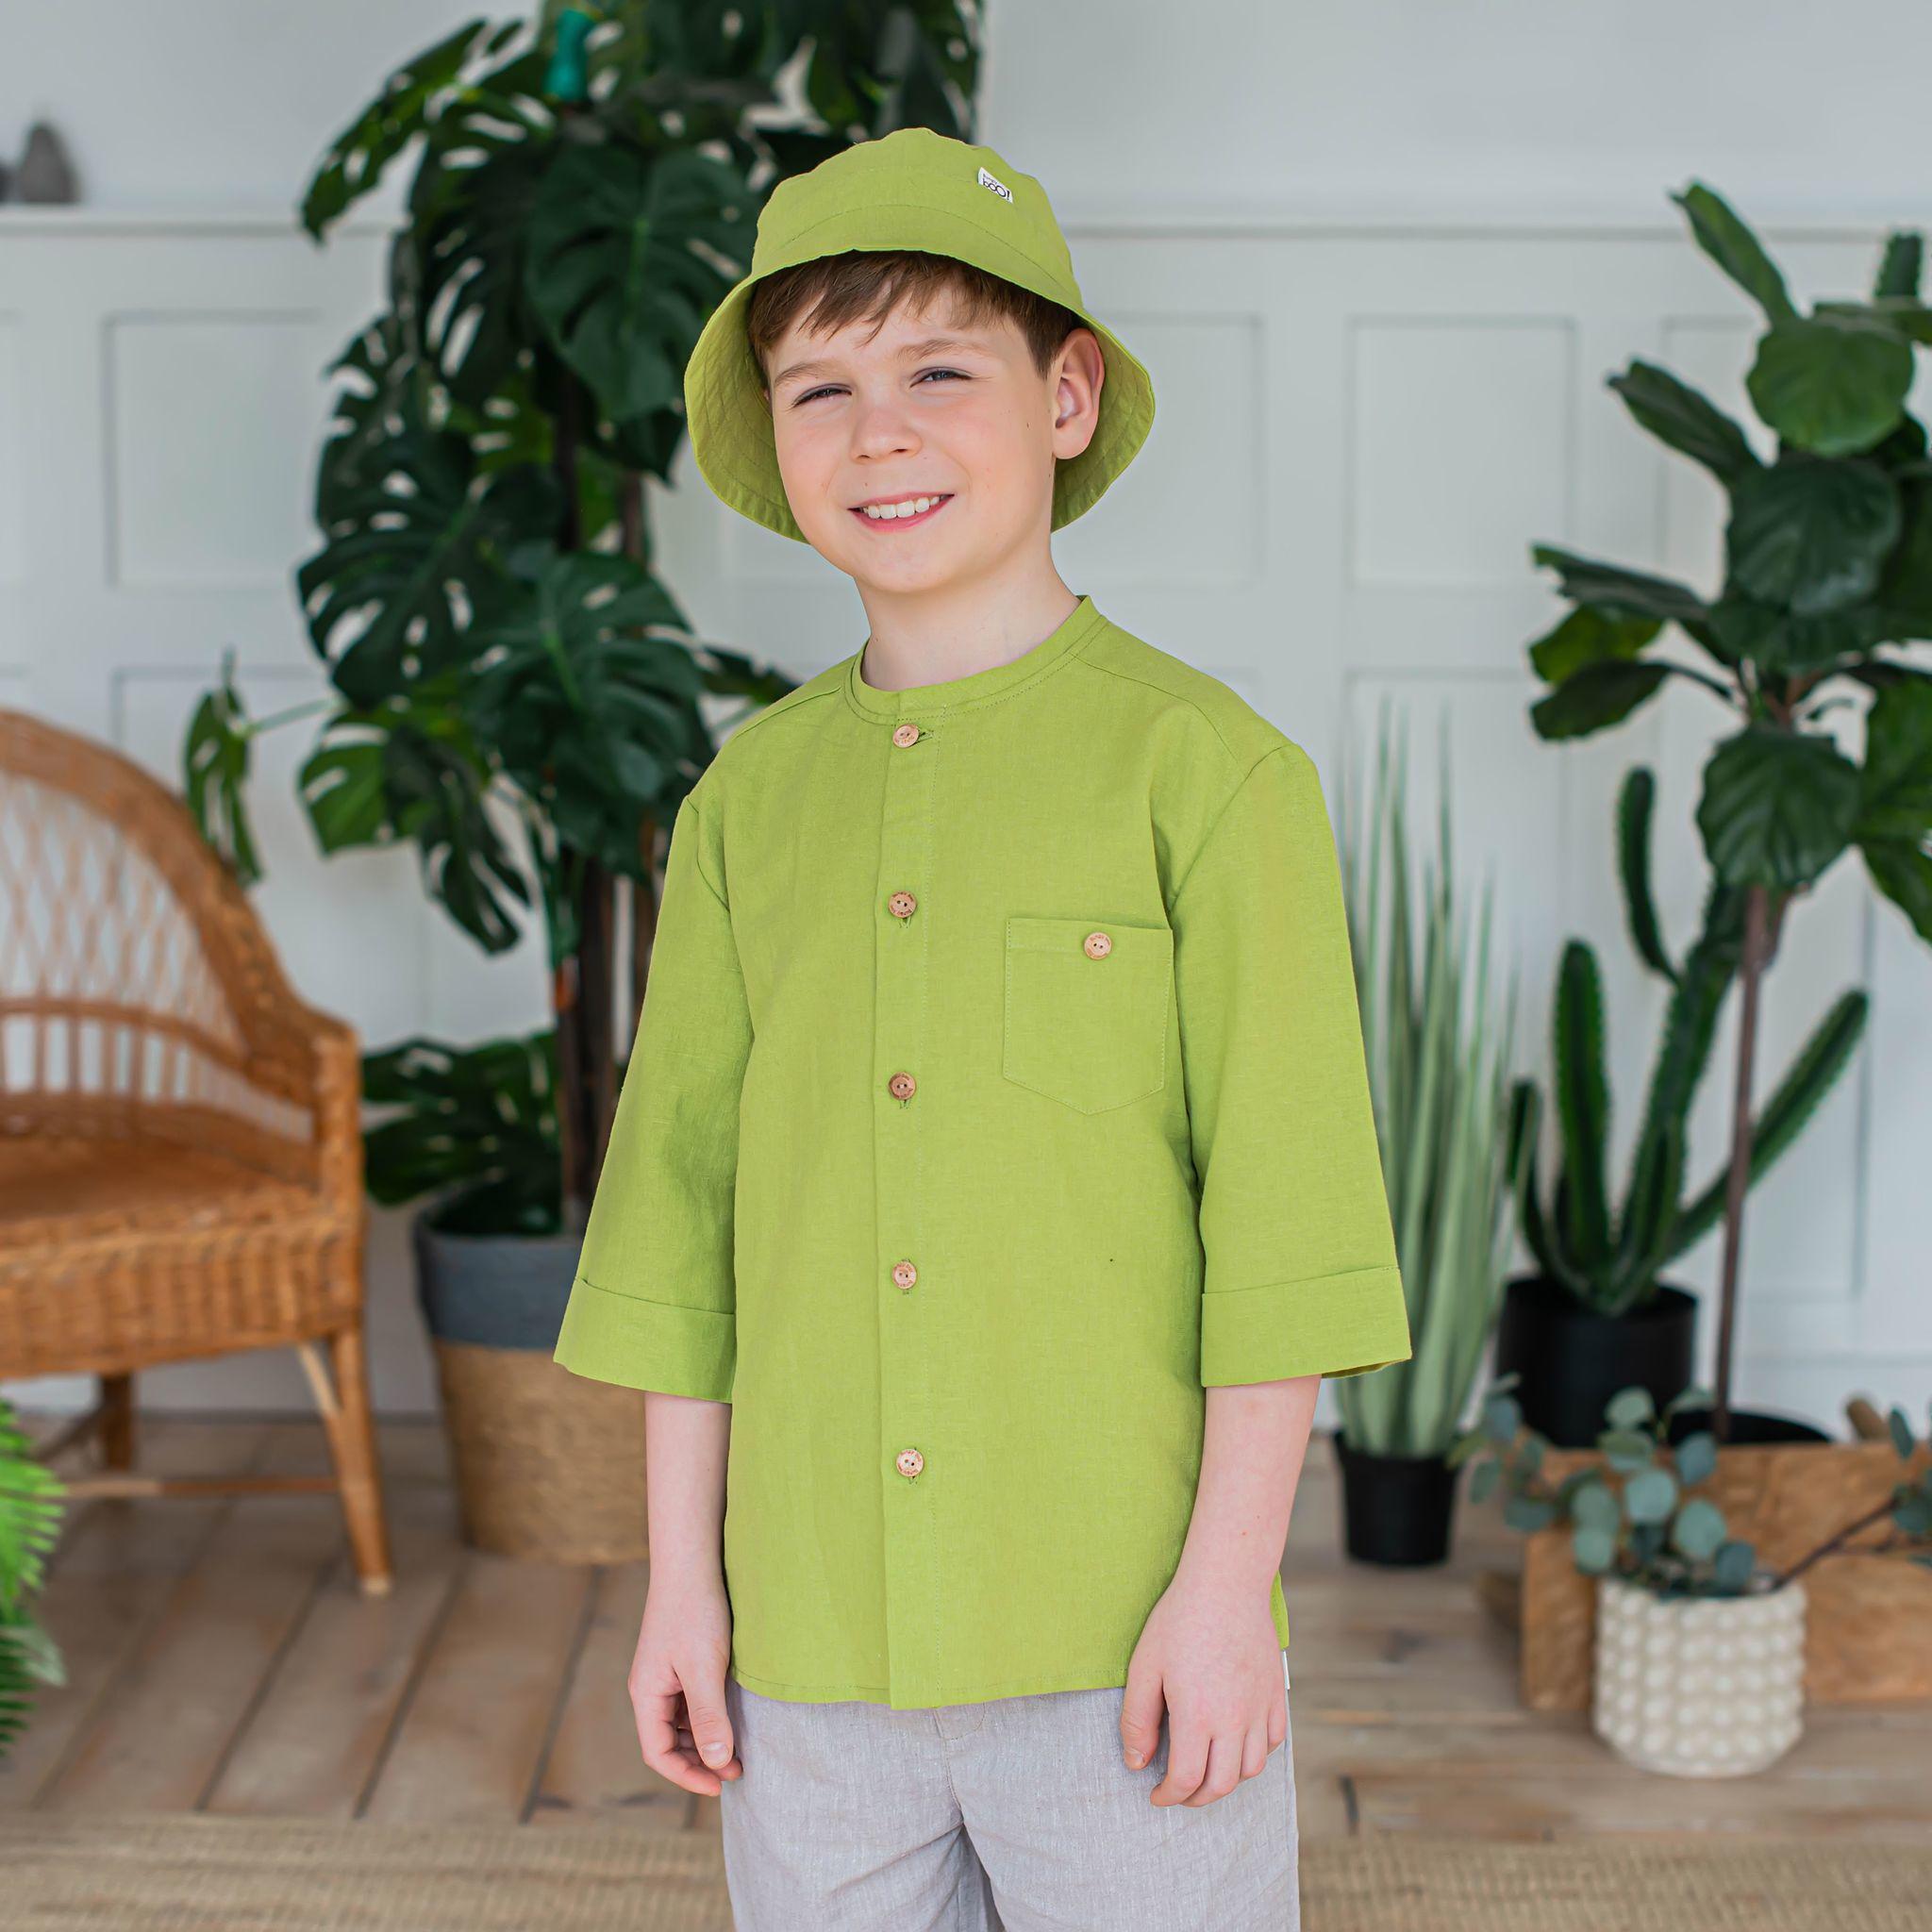 Cotton shirt for teens - Lime